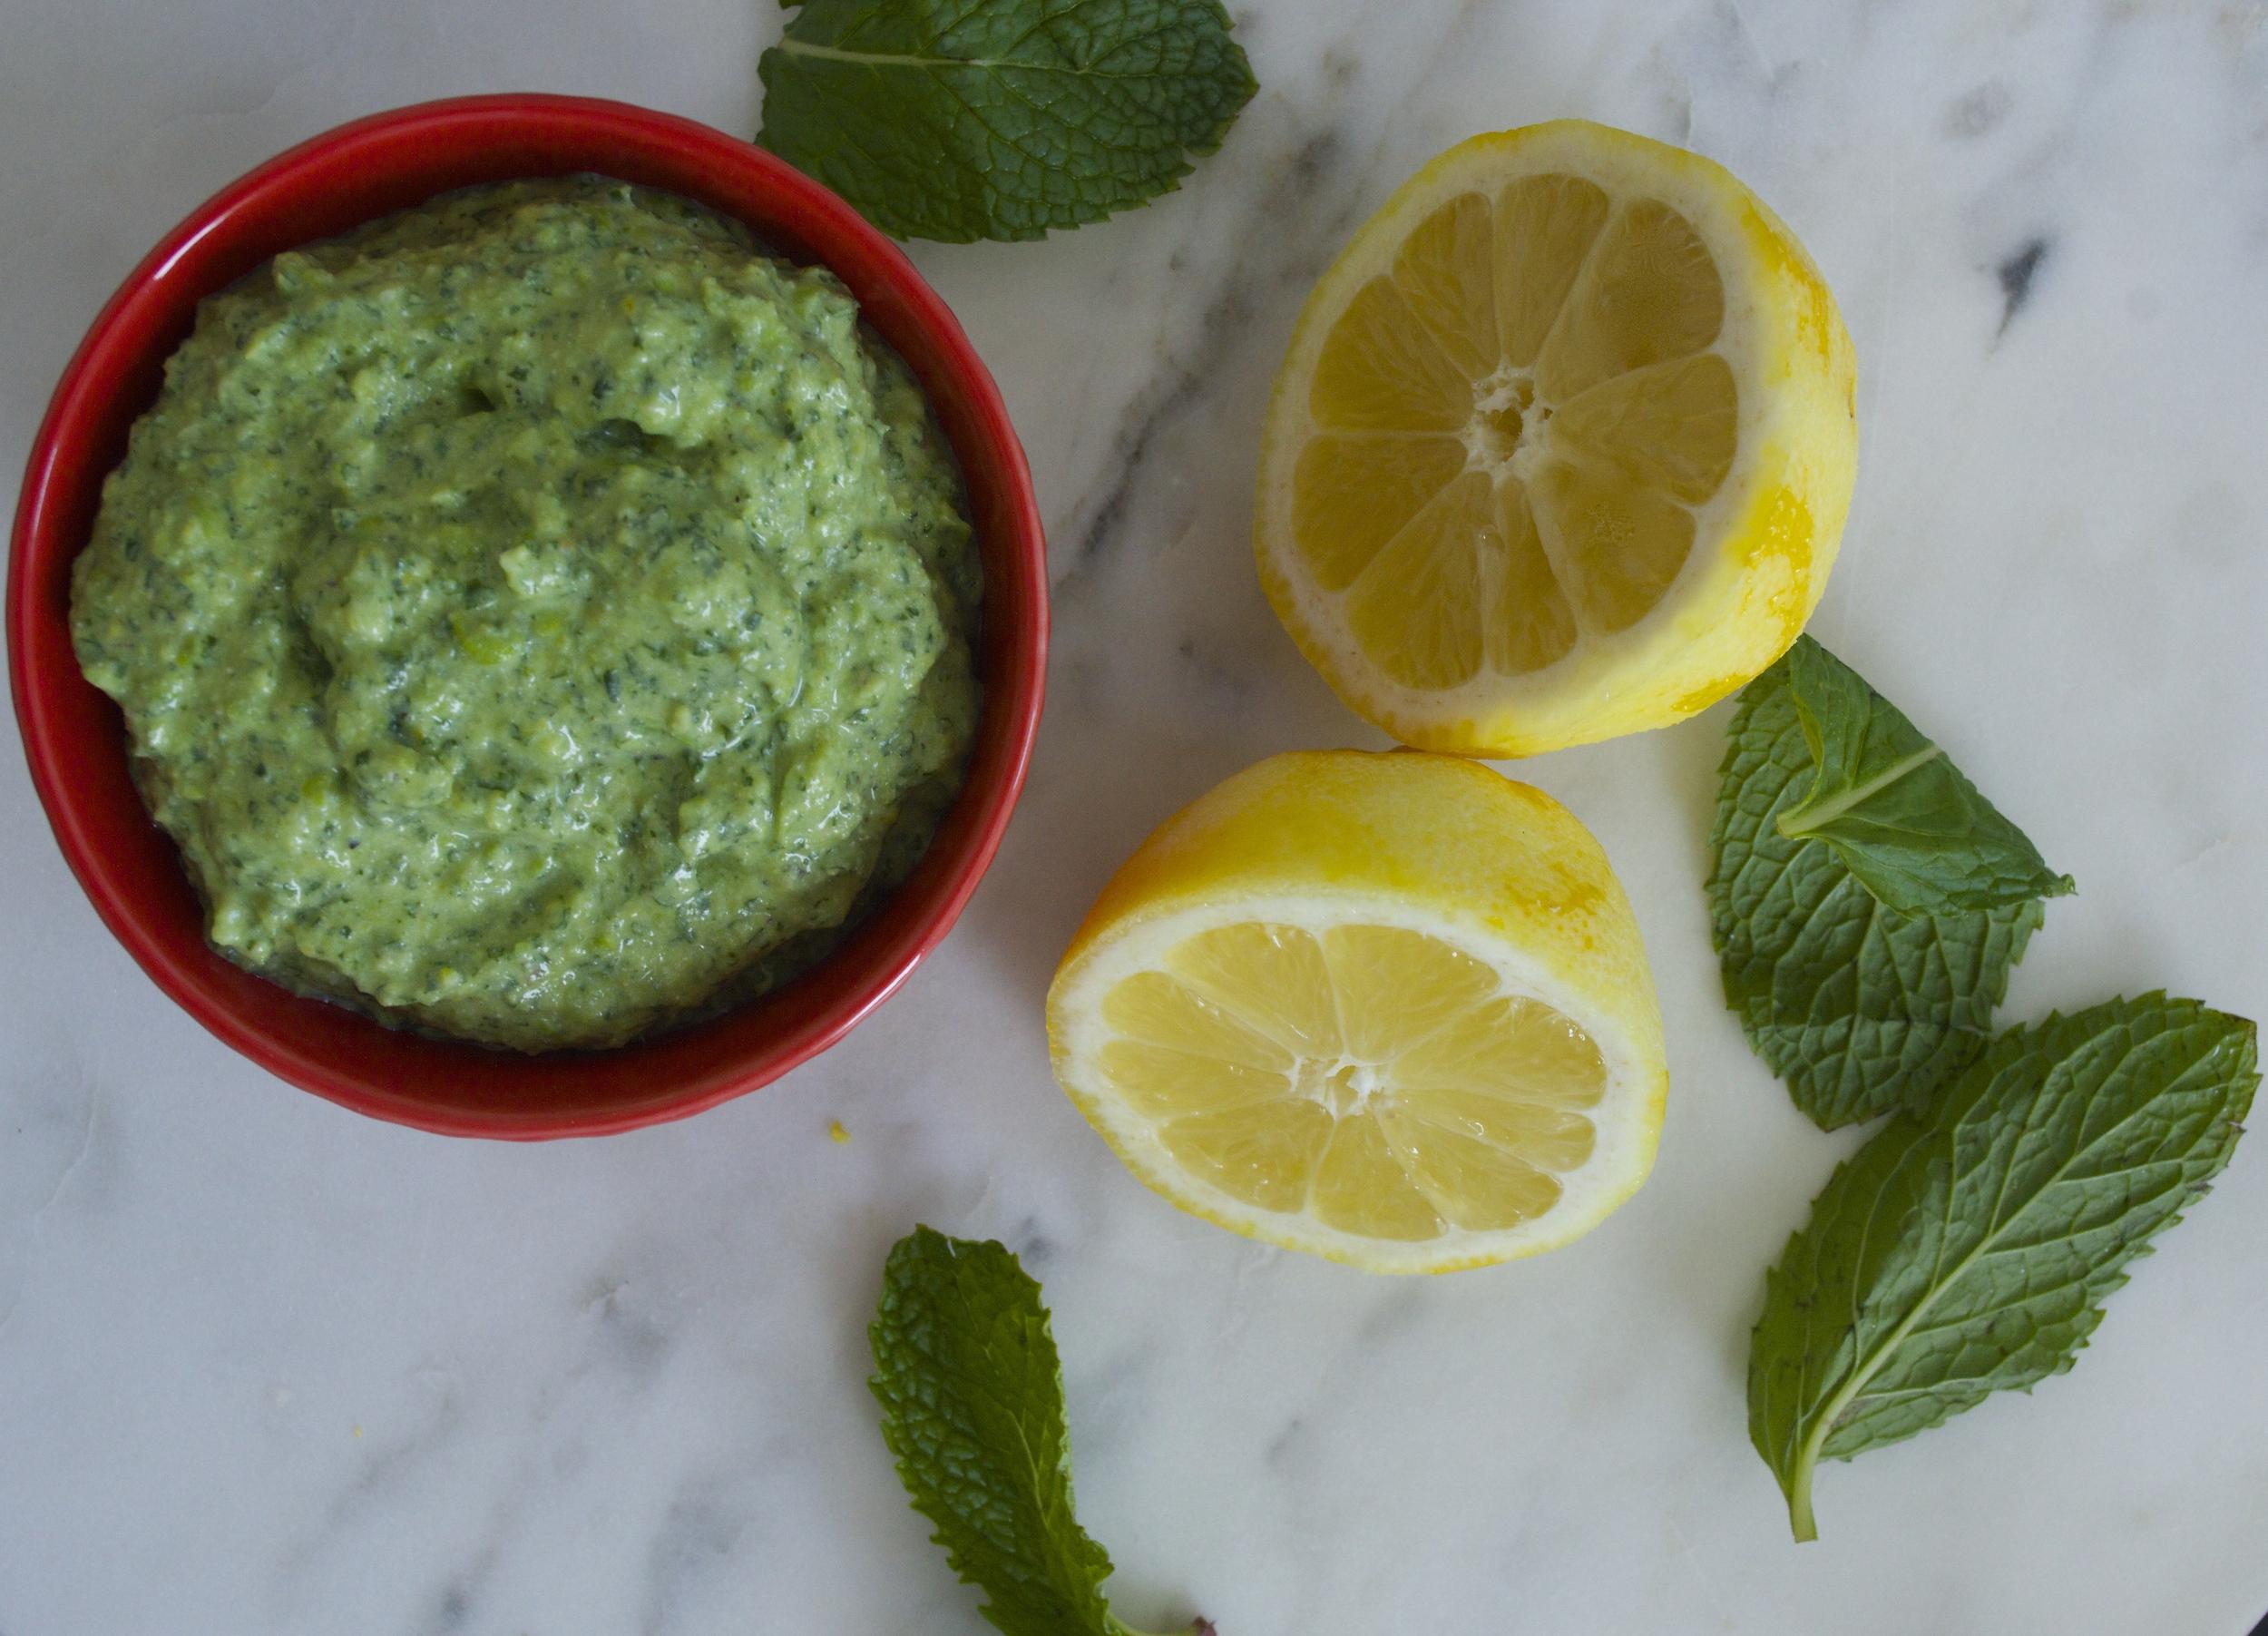 spring-pea-mint-ricotta-lemon-dip-overhead-1-molasses-and-mayhem.jpg